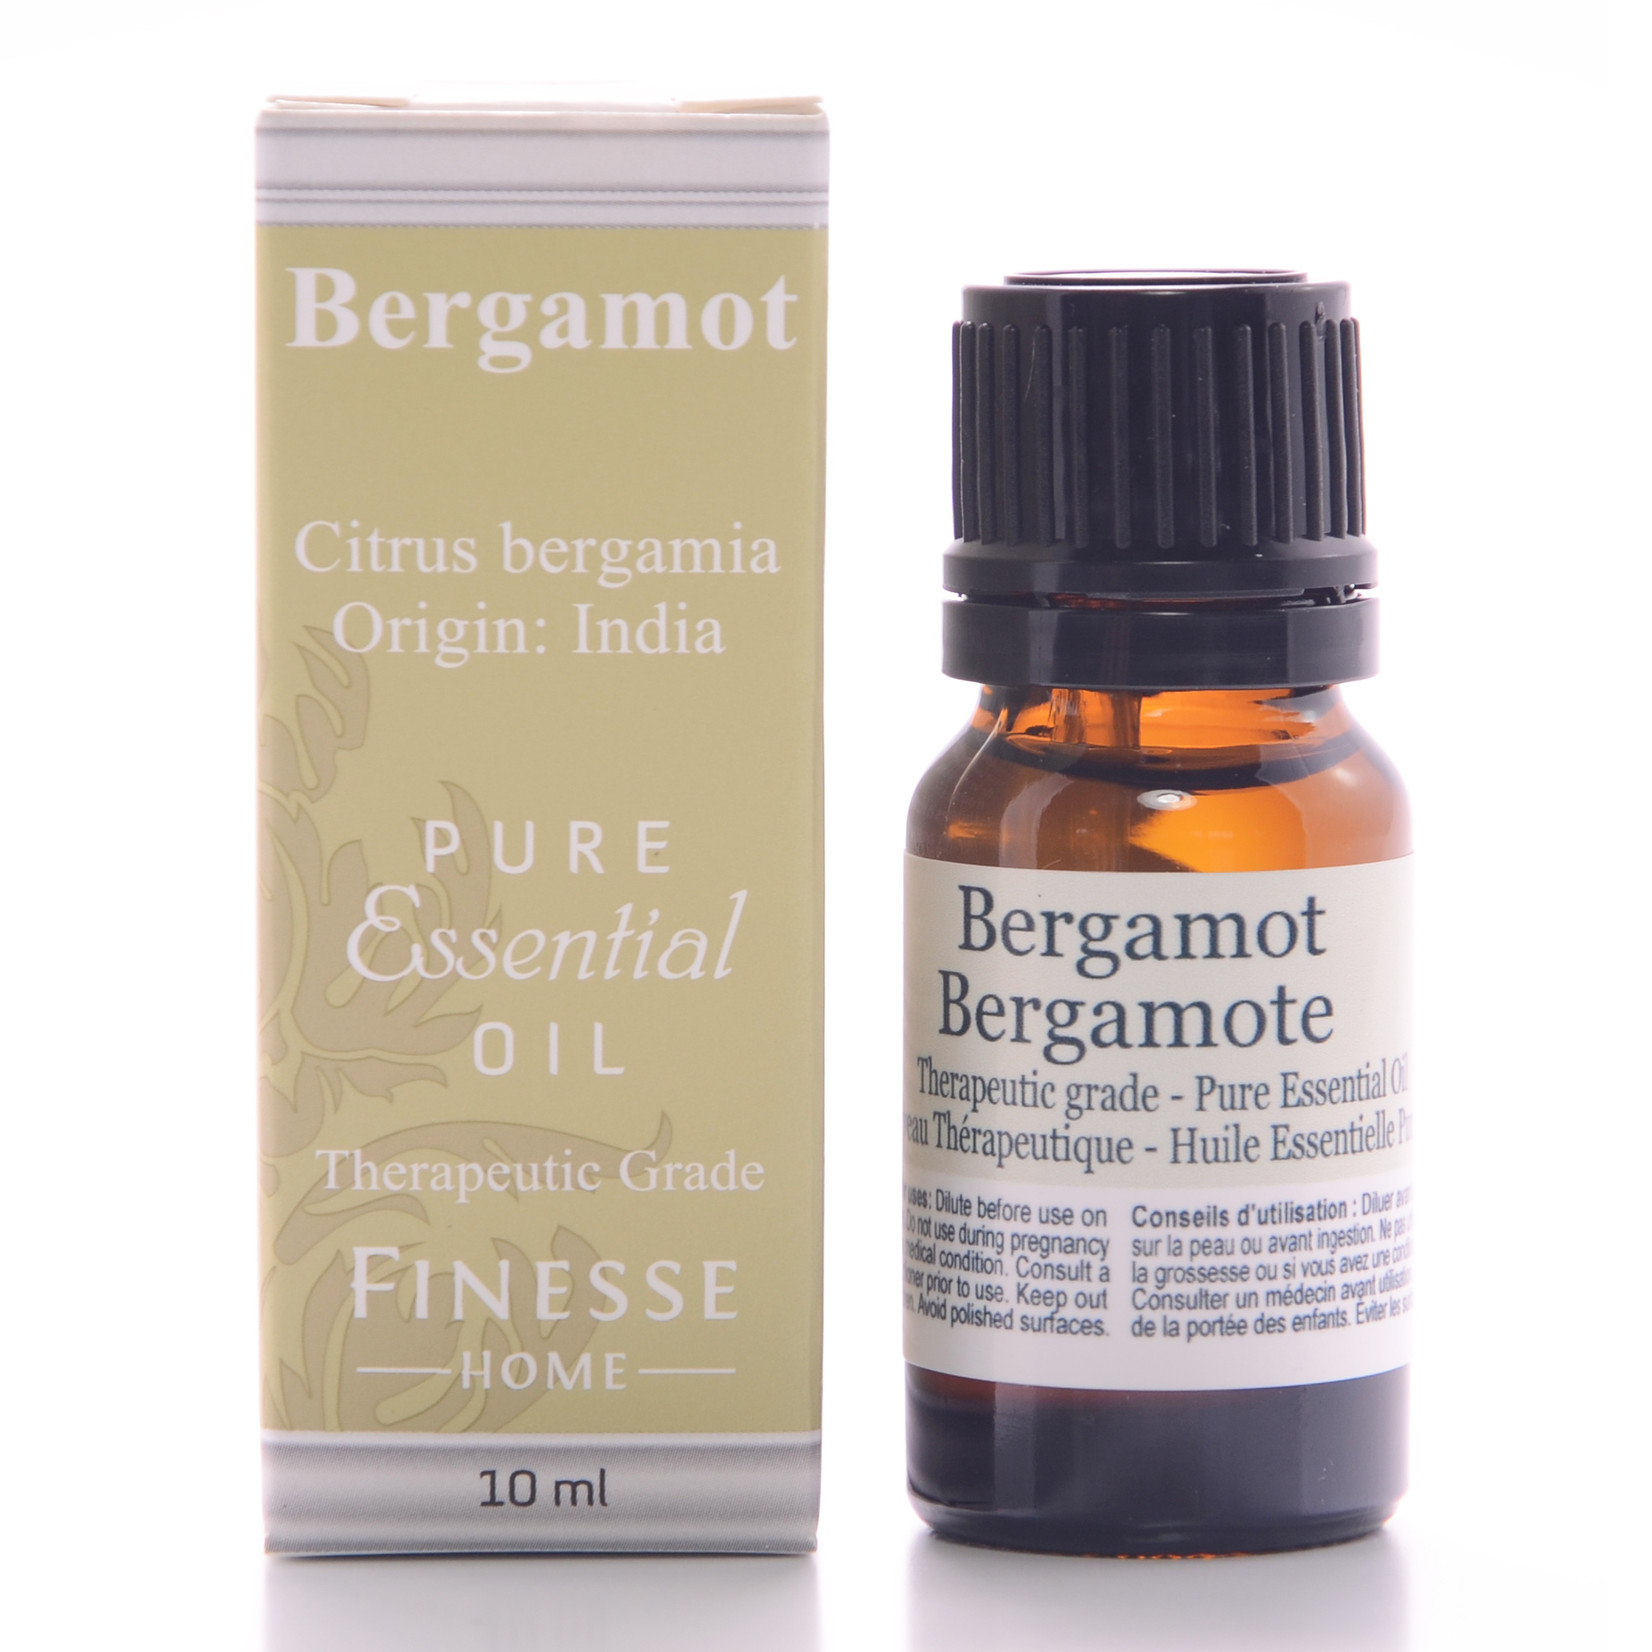 Finesse Home ~ Bergamot Essential Oil